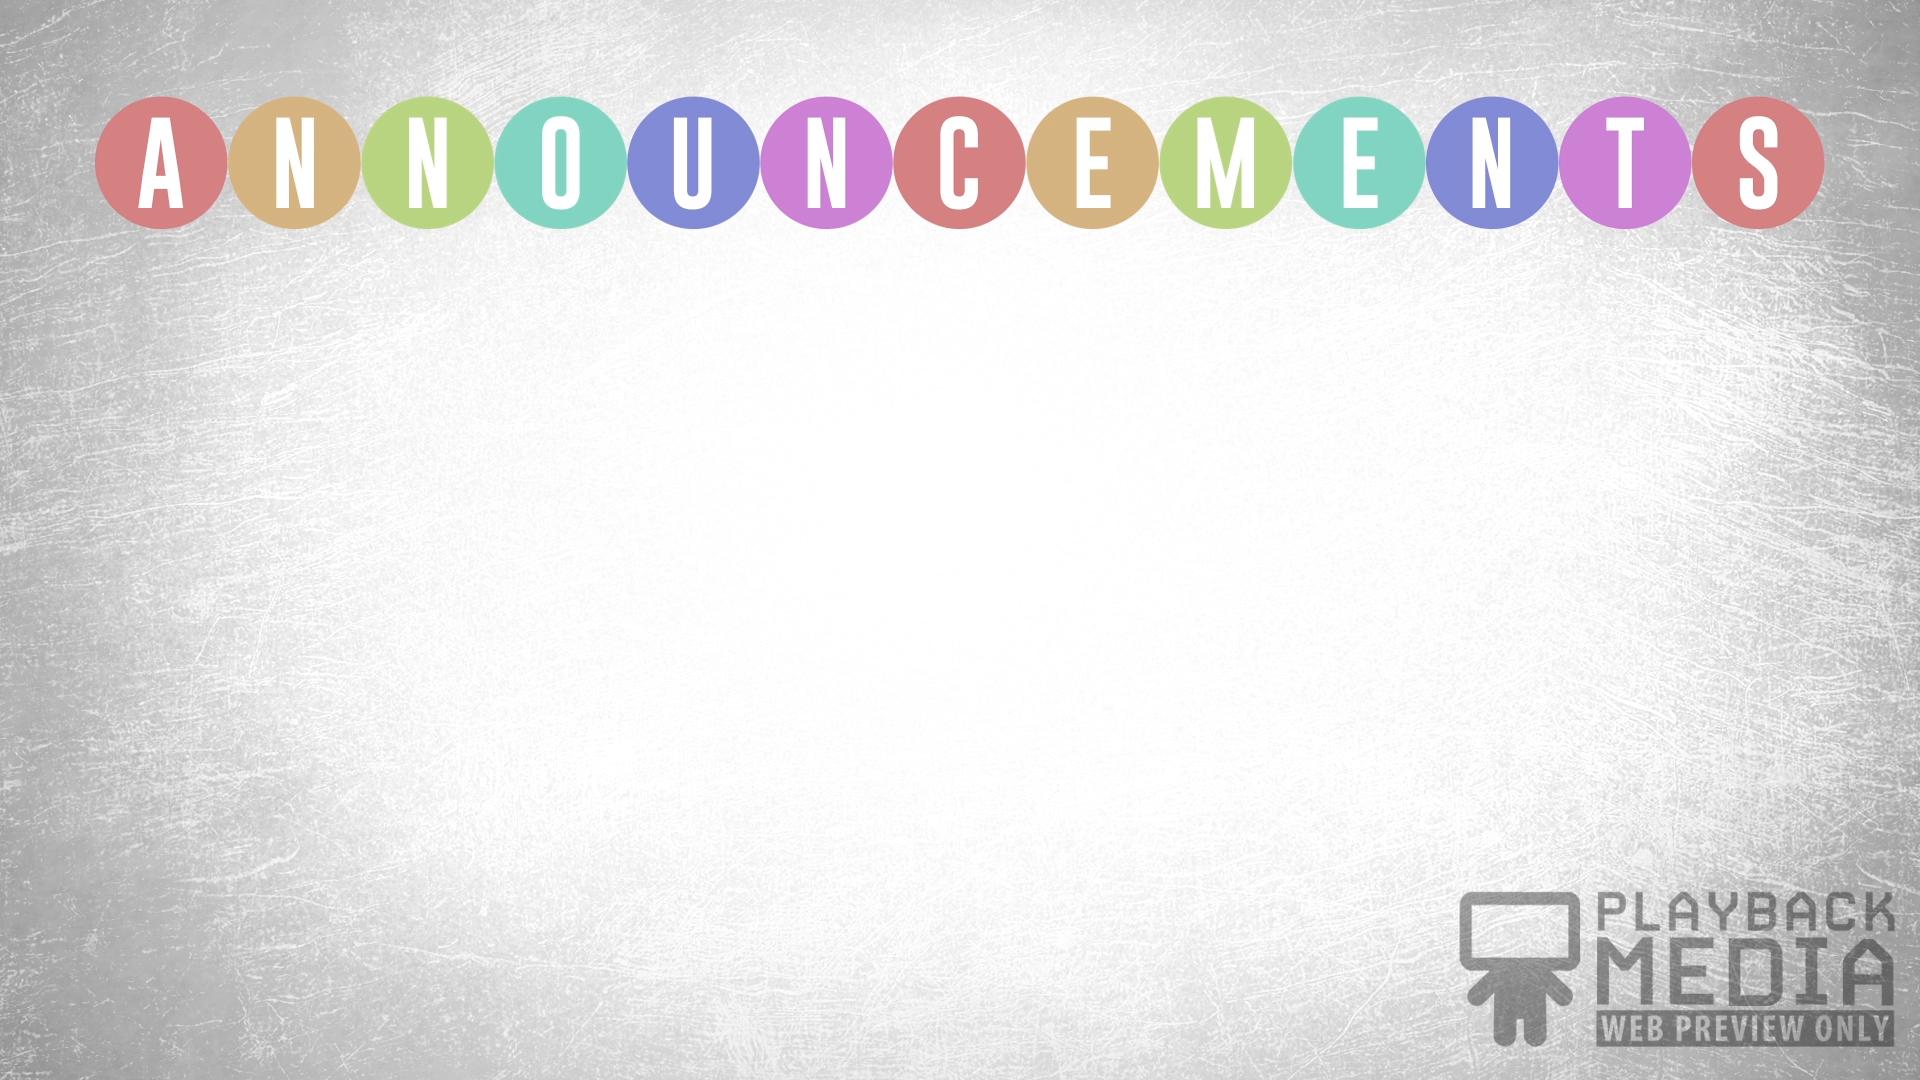 Event Planner Announcements Motion Image